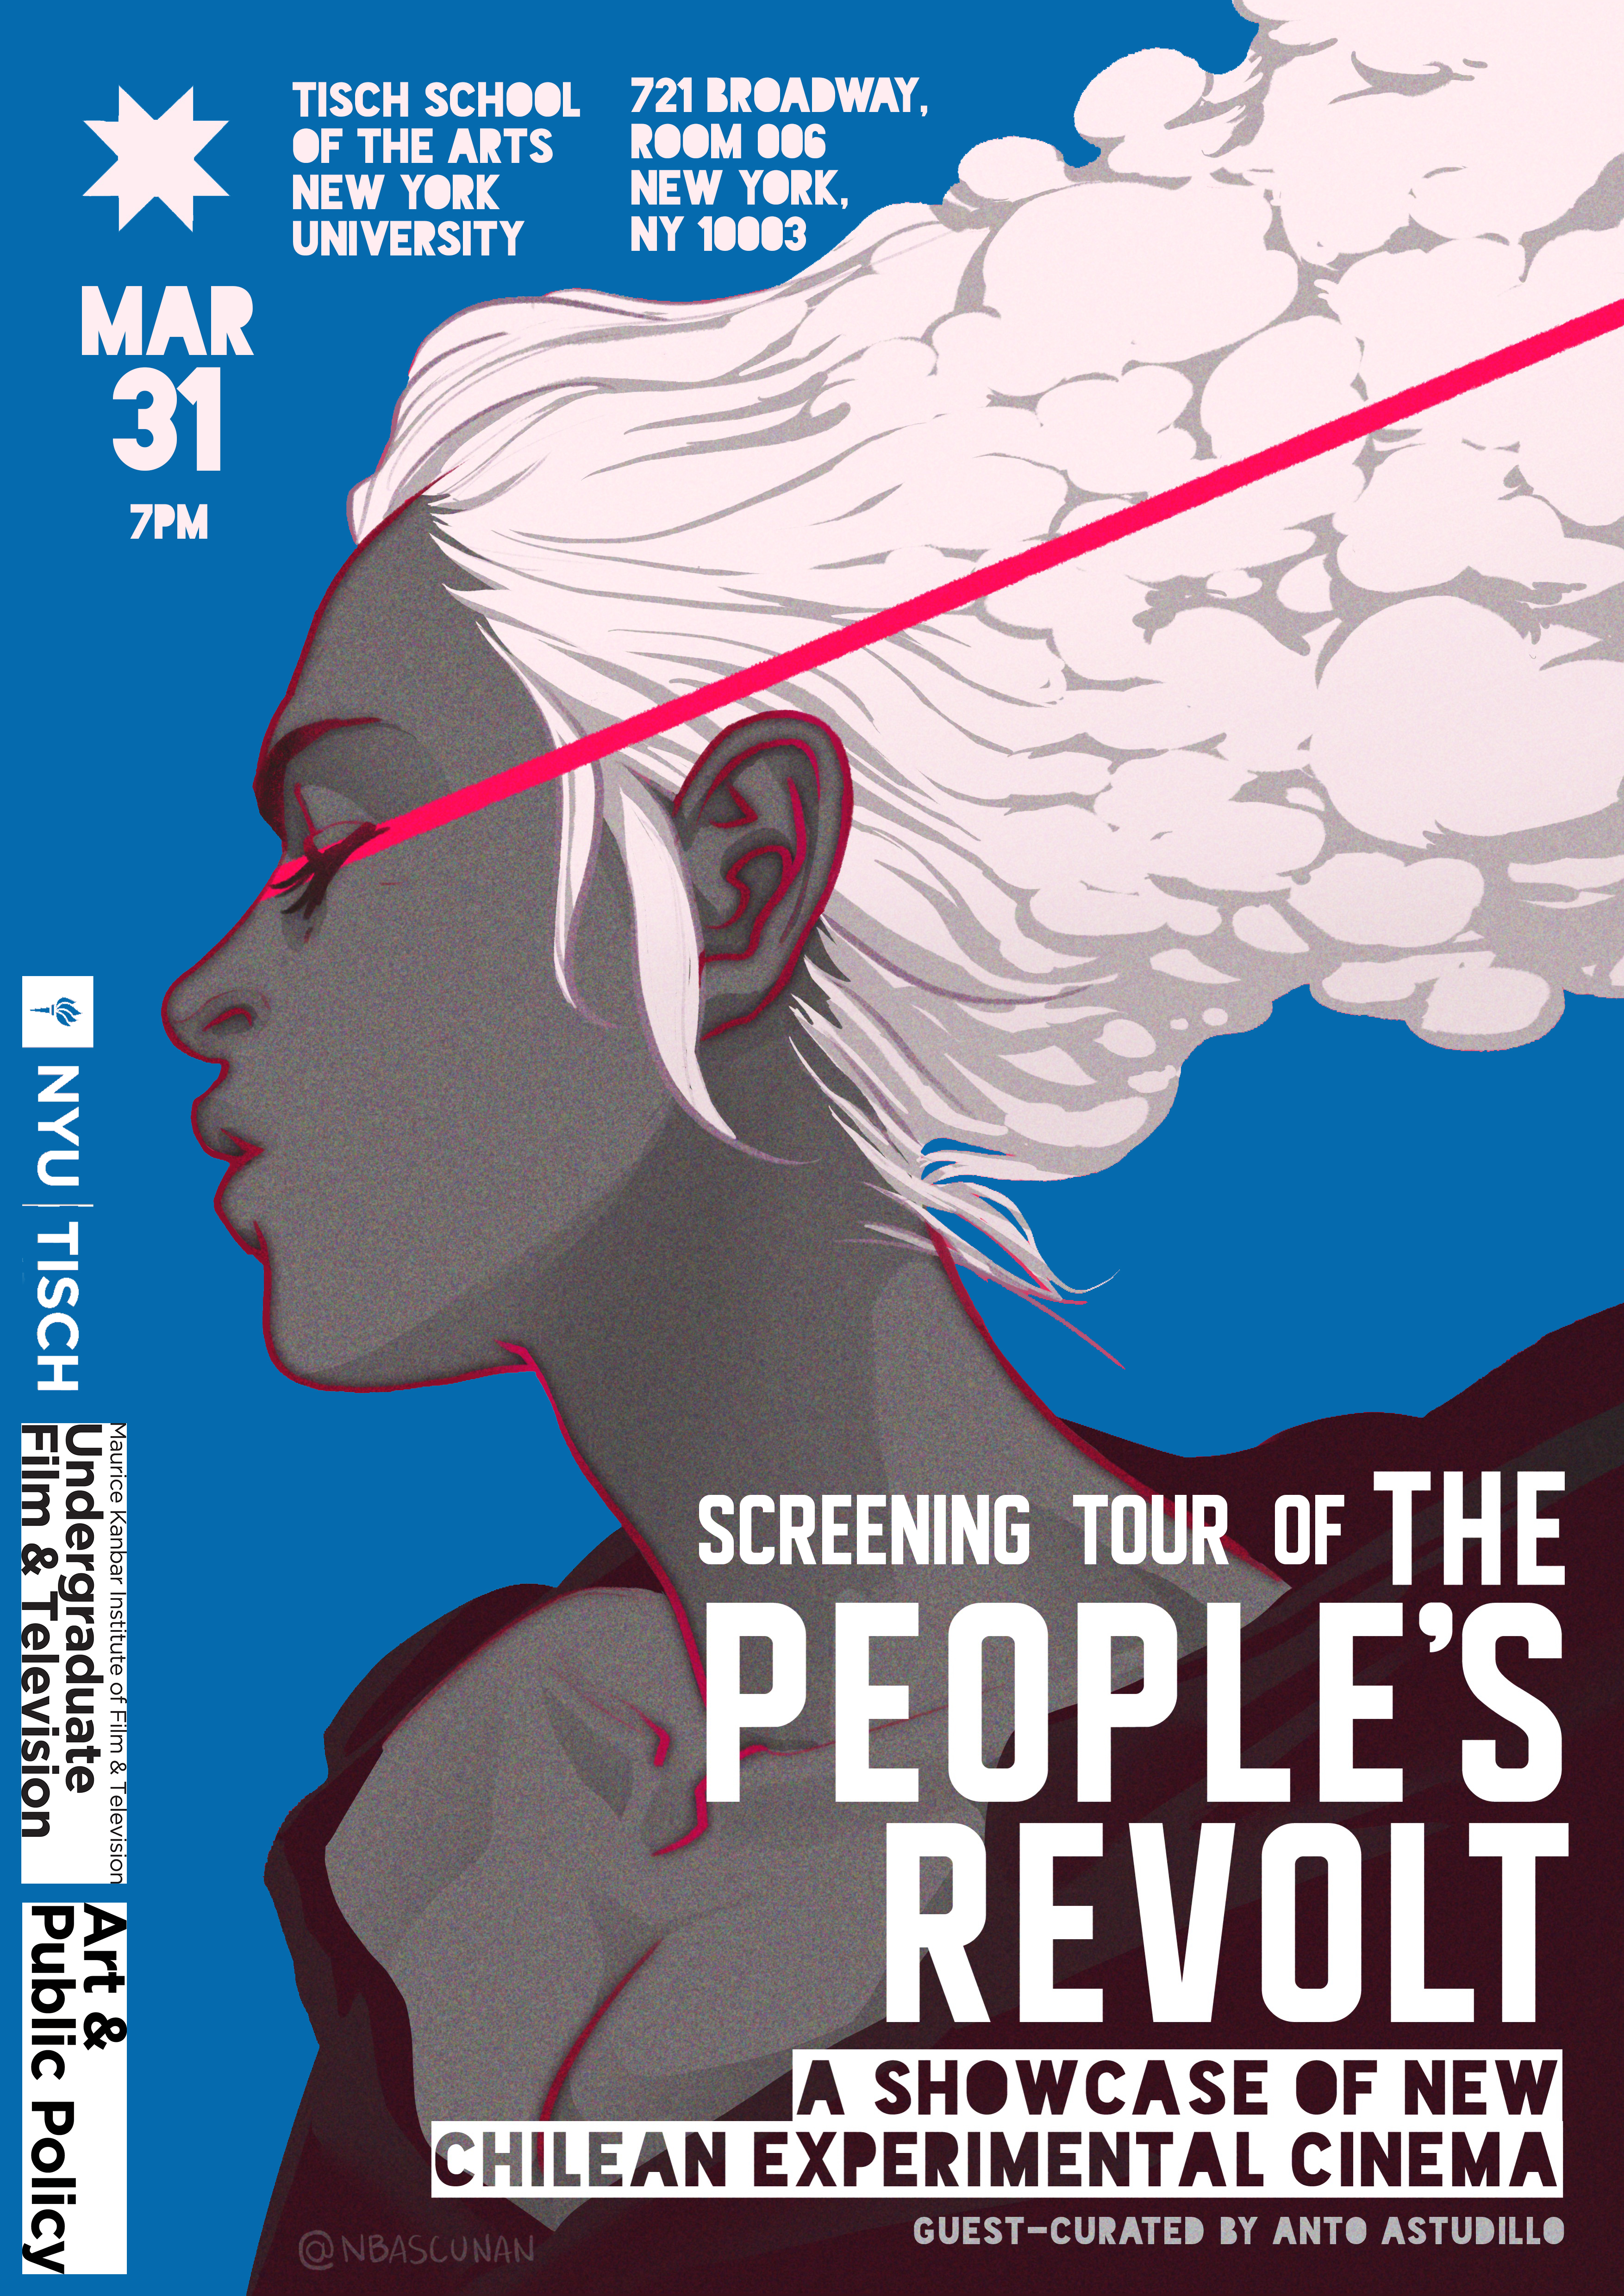 The_People's_Revolt-en-wd NYU-option01.j